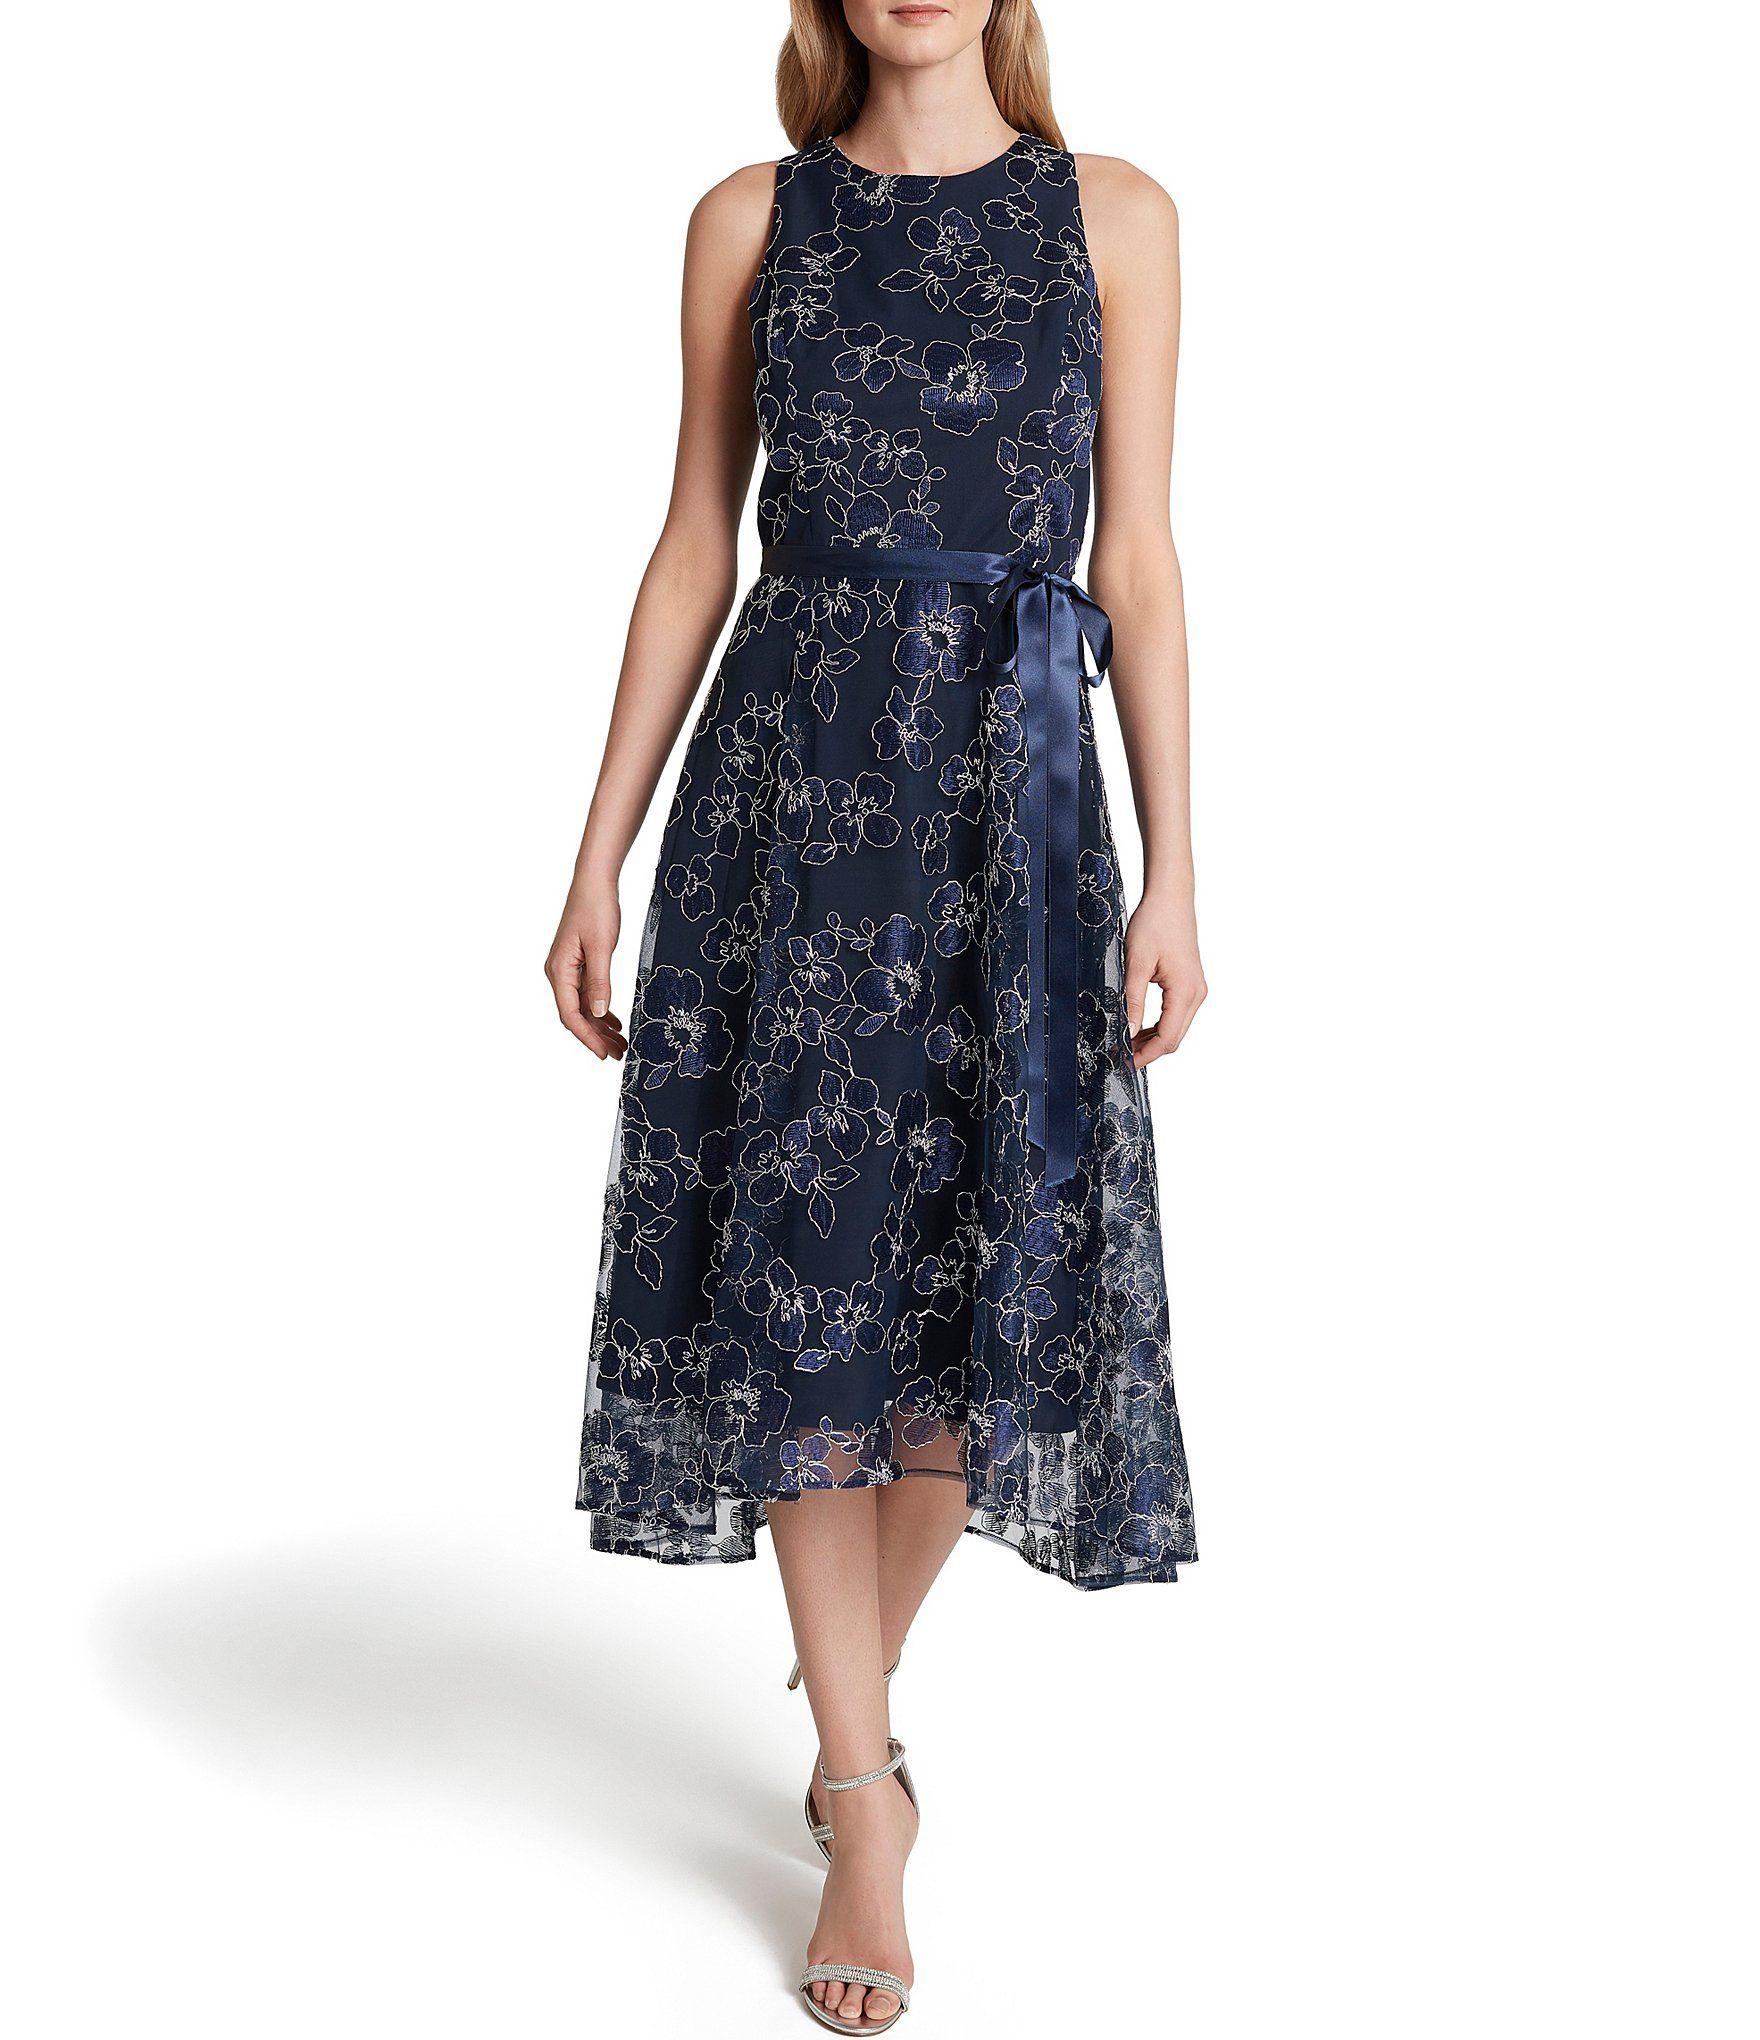 Shop For Tahari Asl Floral Embroidered Mesh Satin Ribbon Tie Waist Midi Dress At Dillard S Visit Dillard S To Find Clothing Accessories S